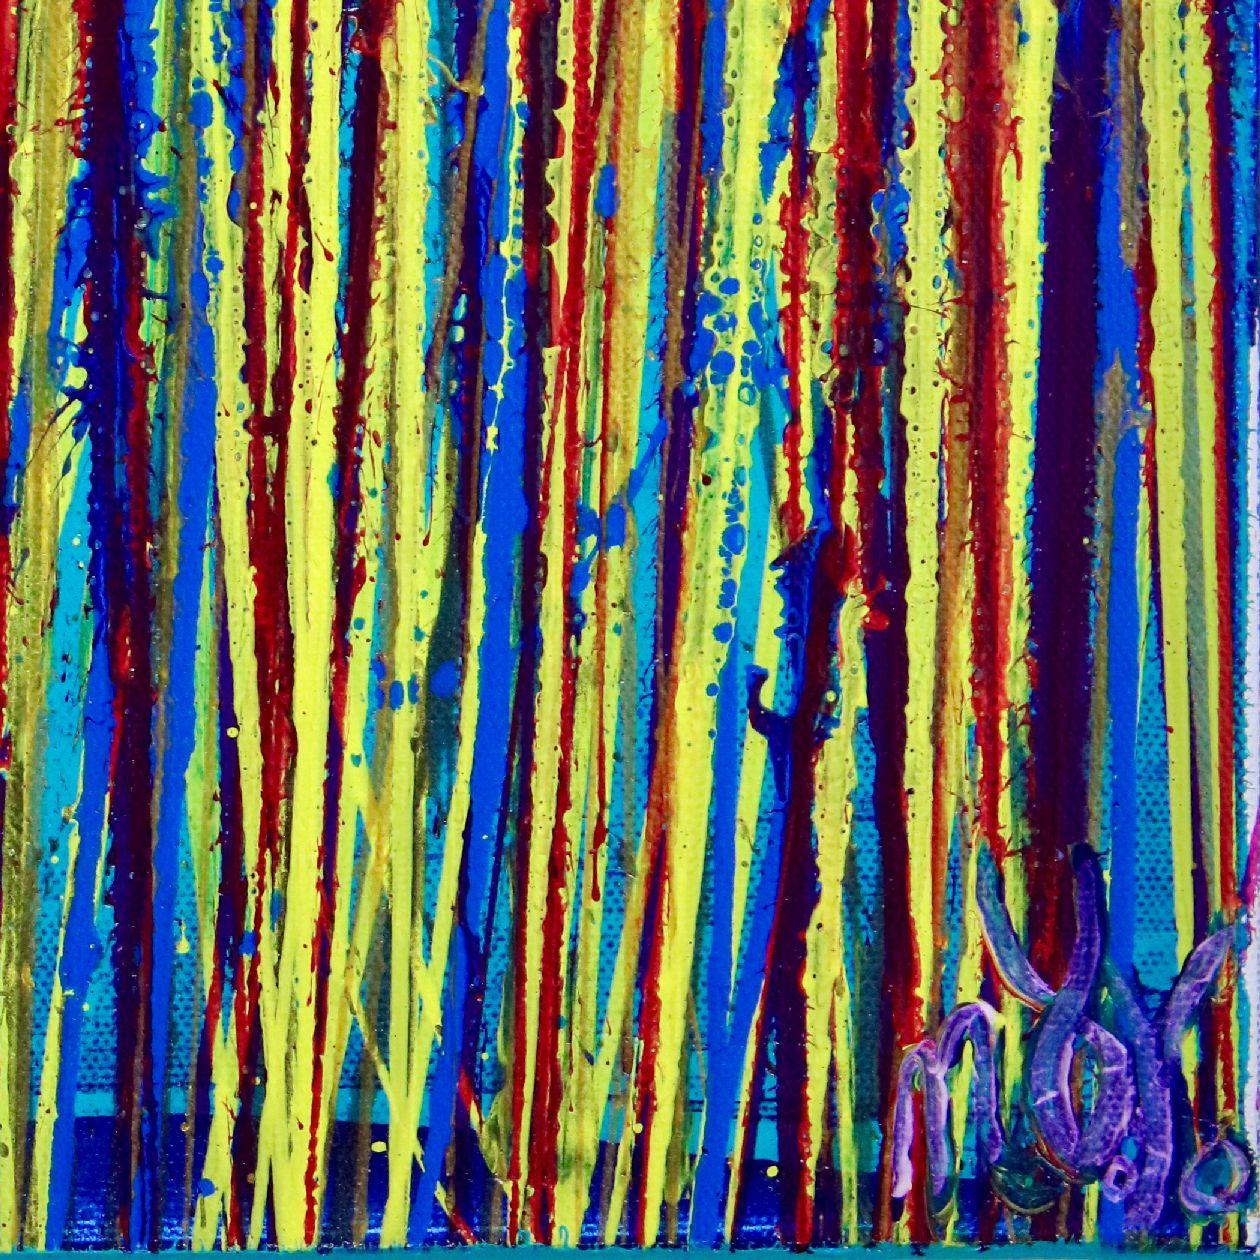 Signature - SOLD - Shimmering Garden 2 (Flow State) by Nestor Toro